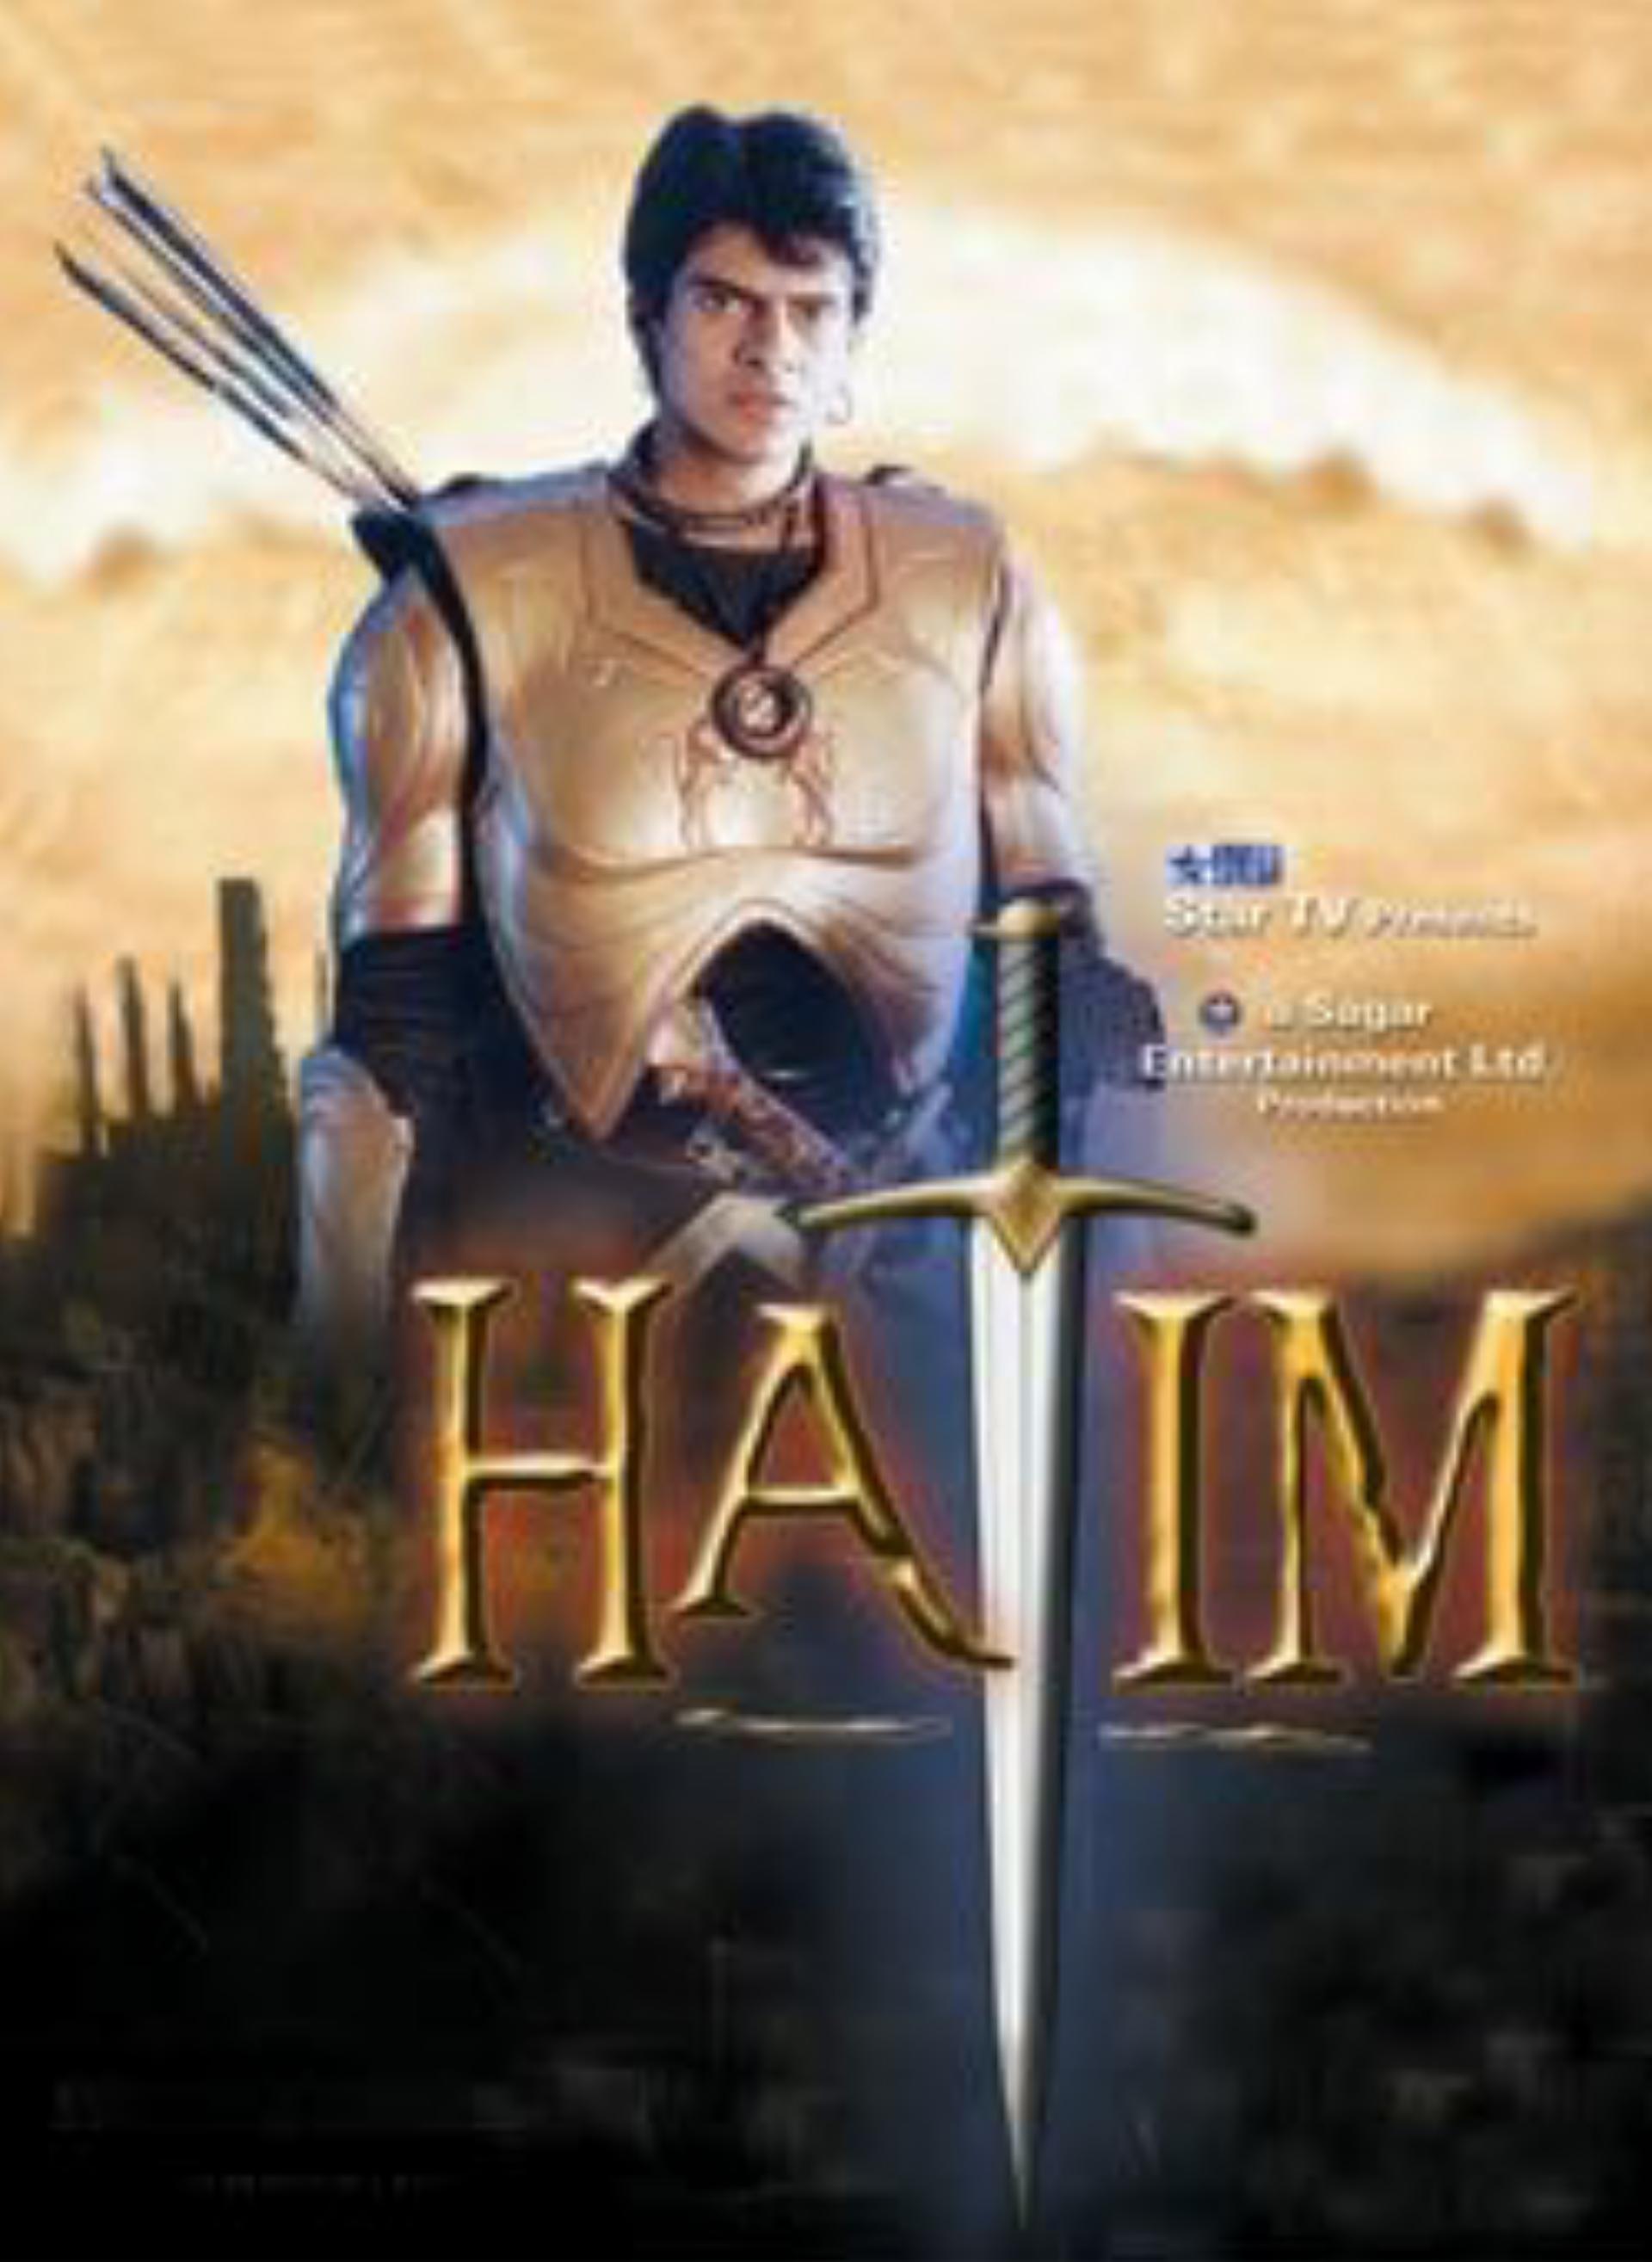 Hatim